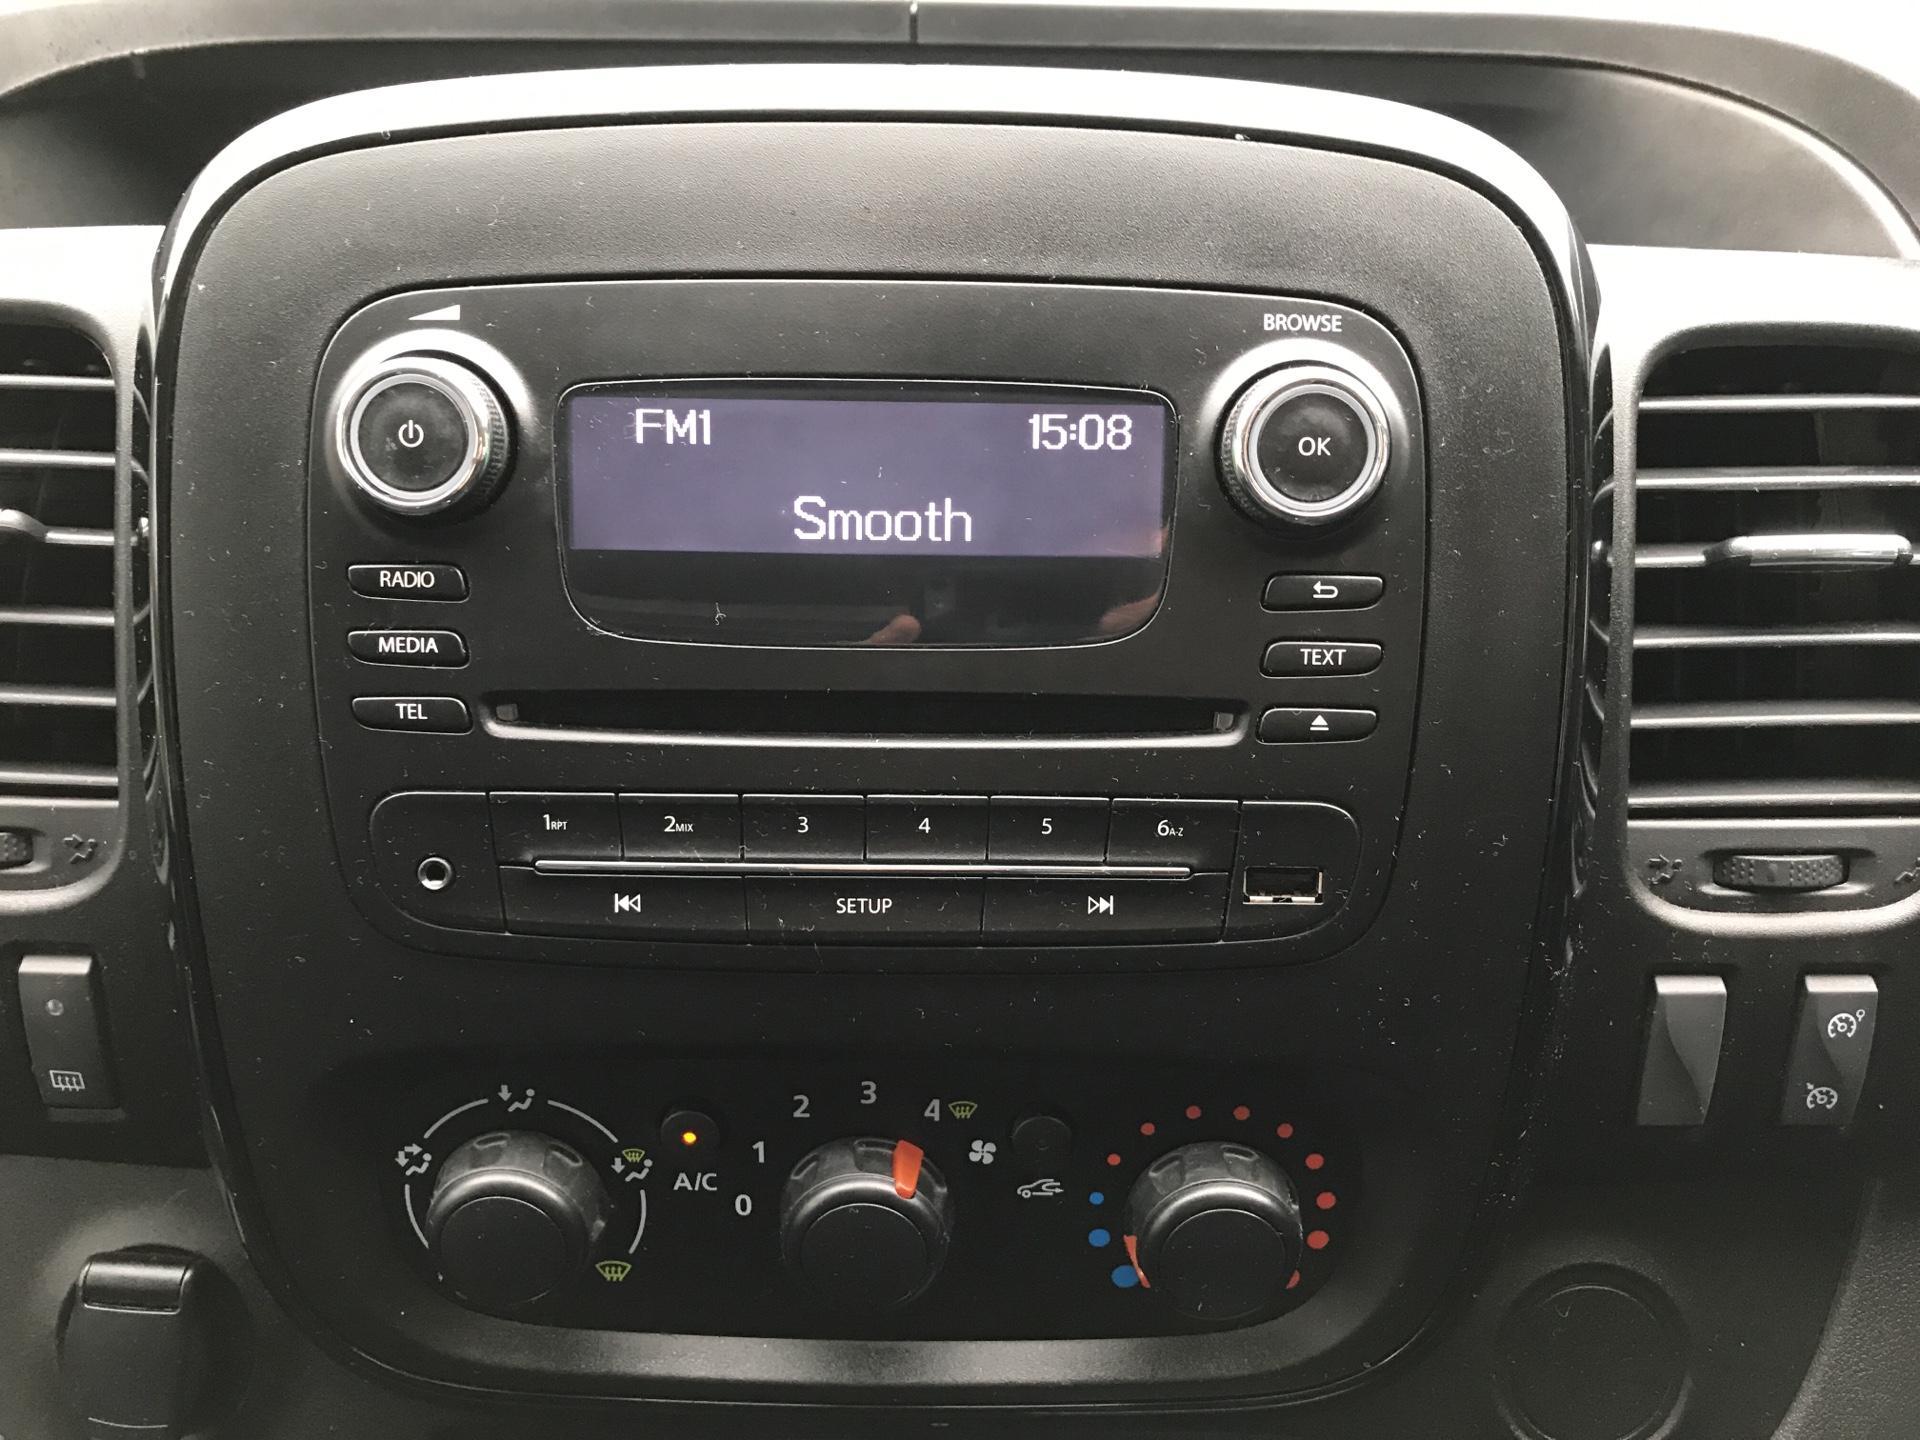 2017 Vauxhall Vivaro L1 H1 2700 1.6 CDTI 120PS SPORTIVE EURO 6 (ND17UNJ) Image 10